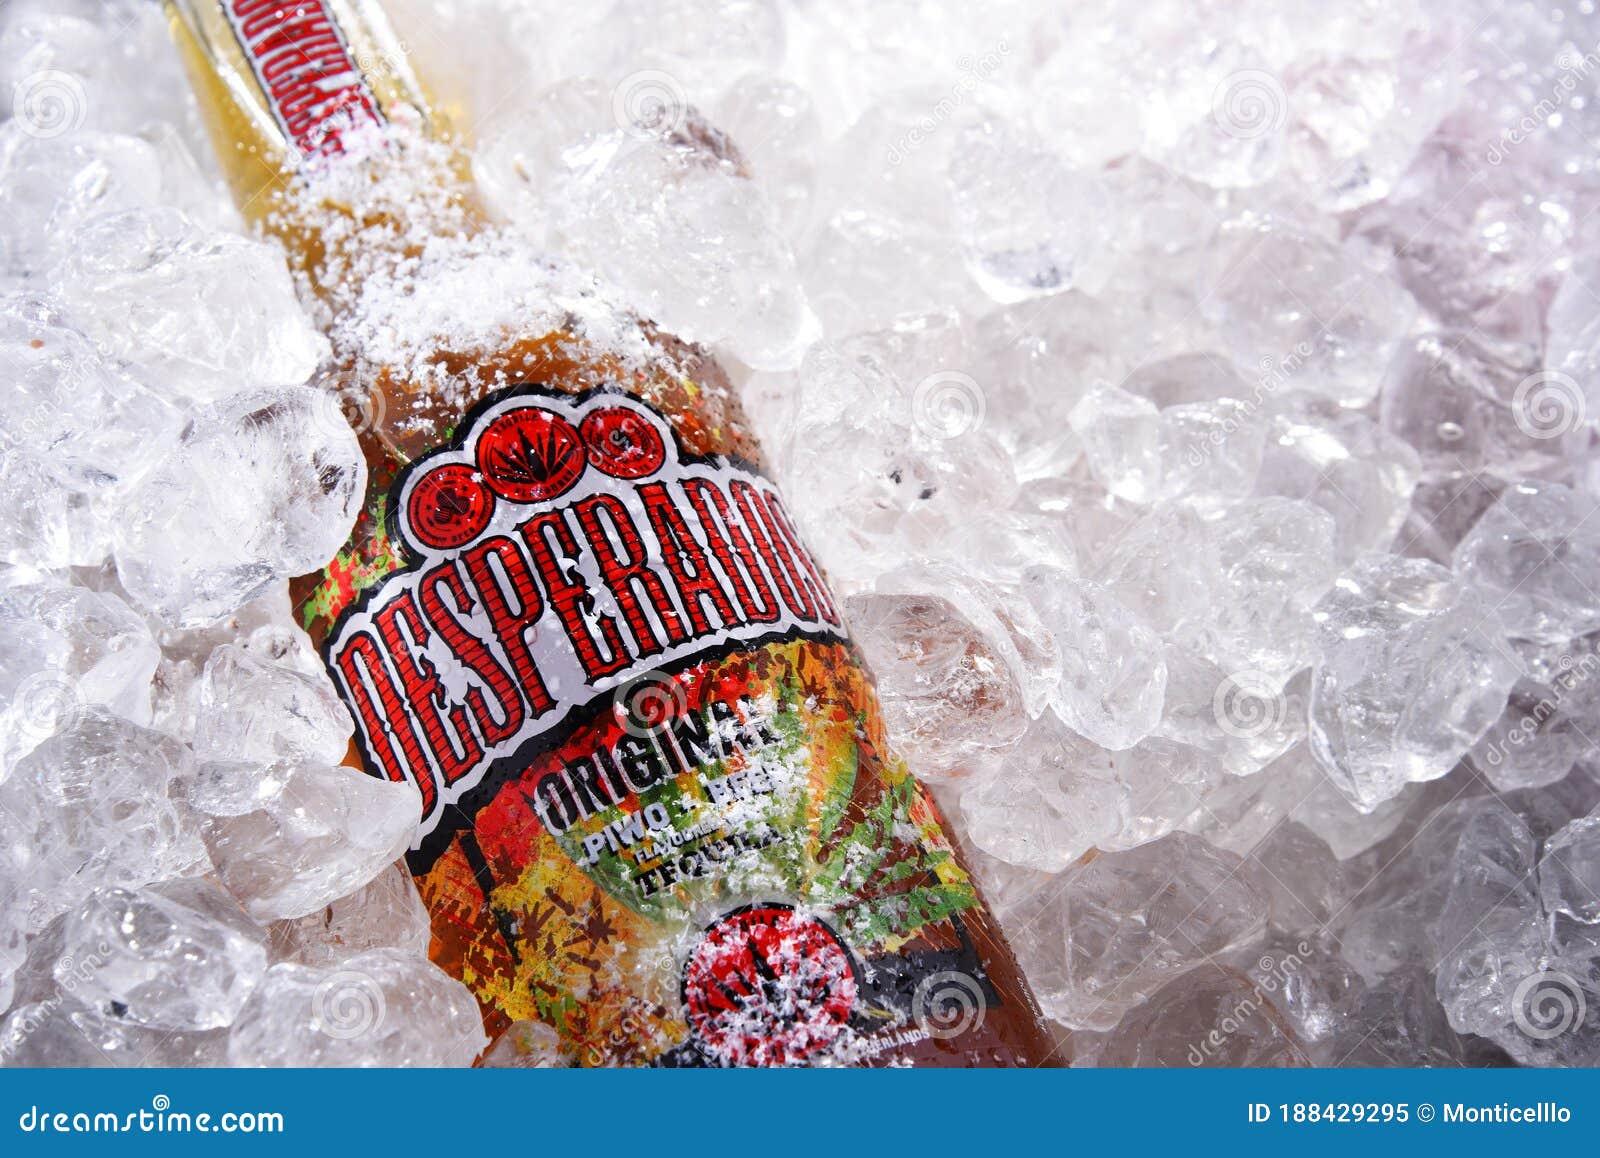 Bottles Of Desperados Beer In Crushed Ice Editorial Image Image Of Beer Label 188429295